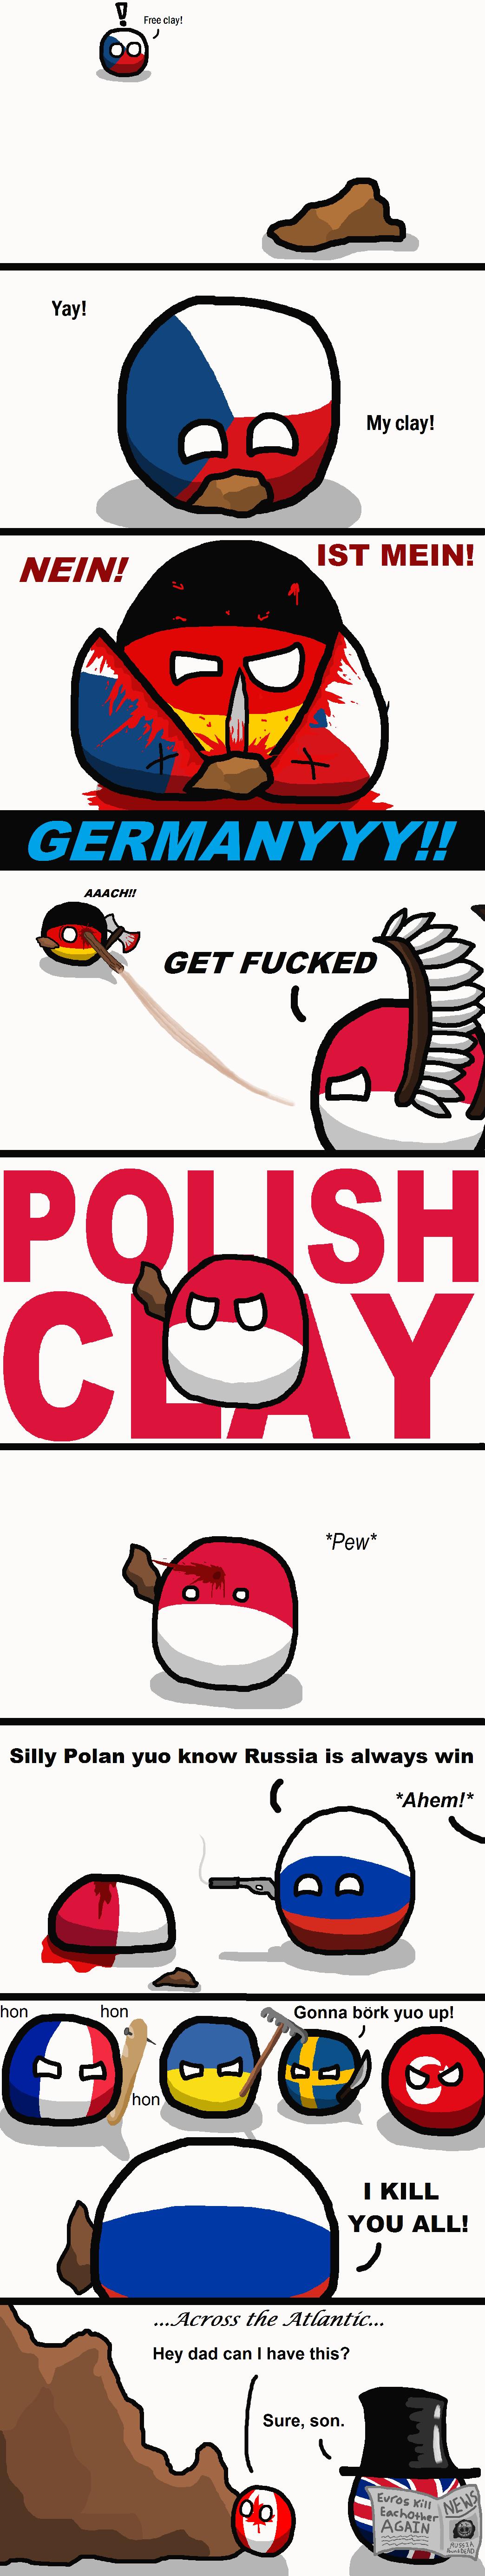 Polandball Comics Scarce+Land.+r+polandball+AaronC14+Yes+I+know+Europeans+fought+over+land_4ee695_4877176